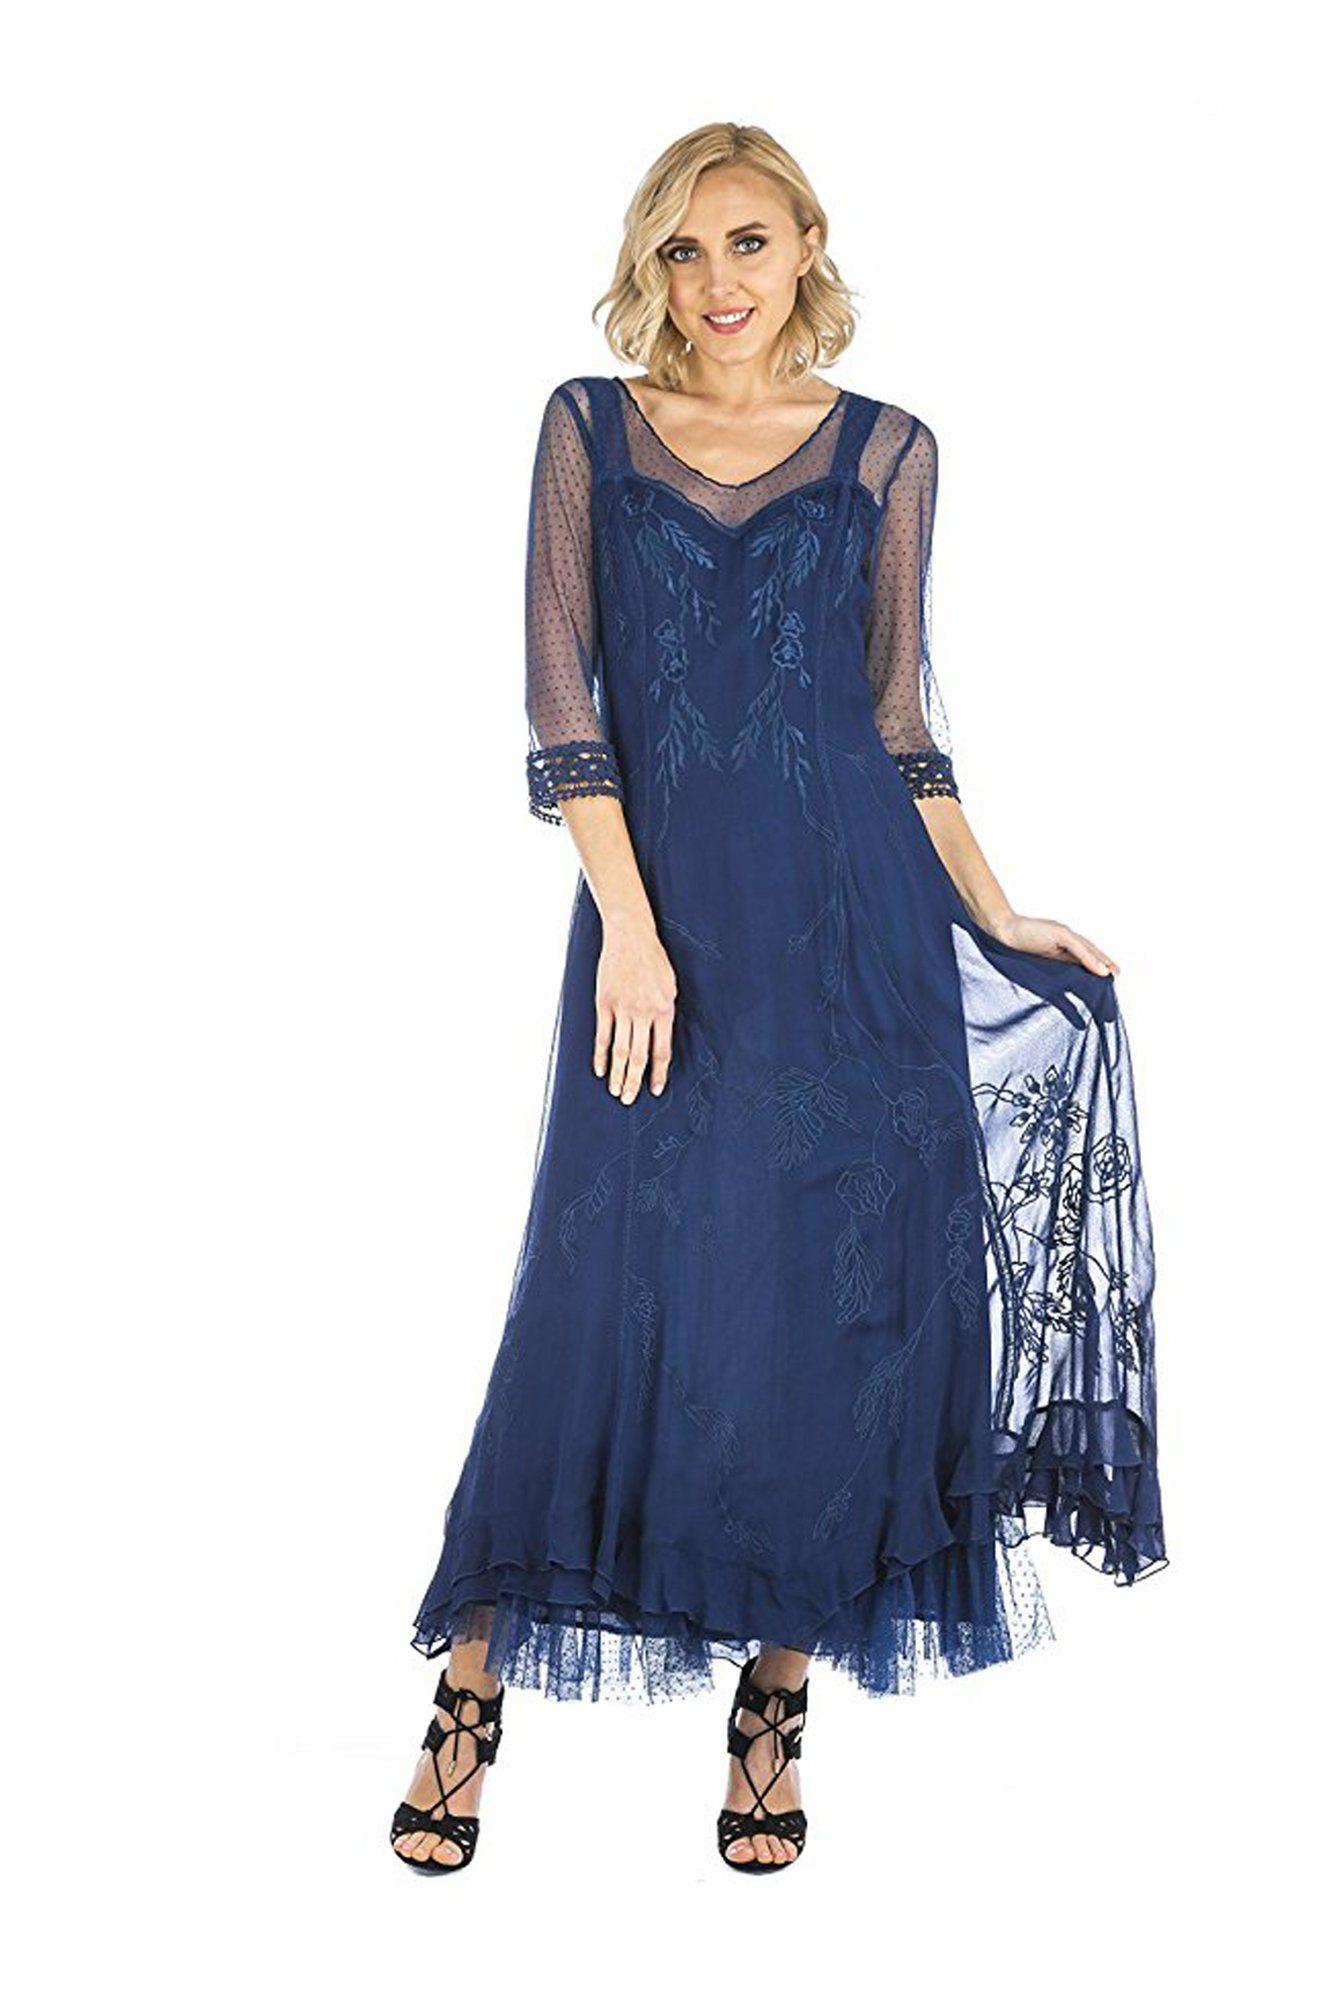 Nataya CL-068 Celine Vintage Style Gown in Royal Blue